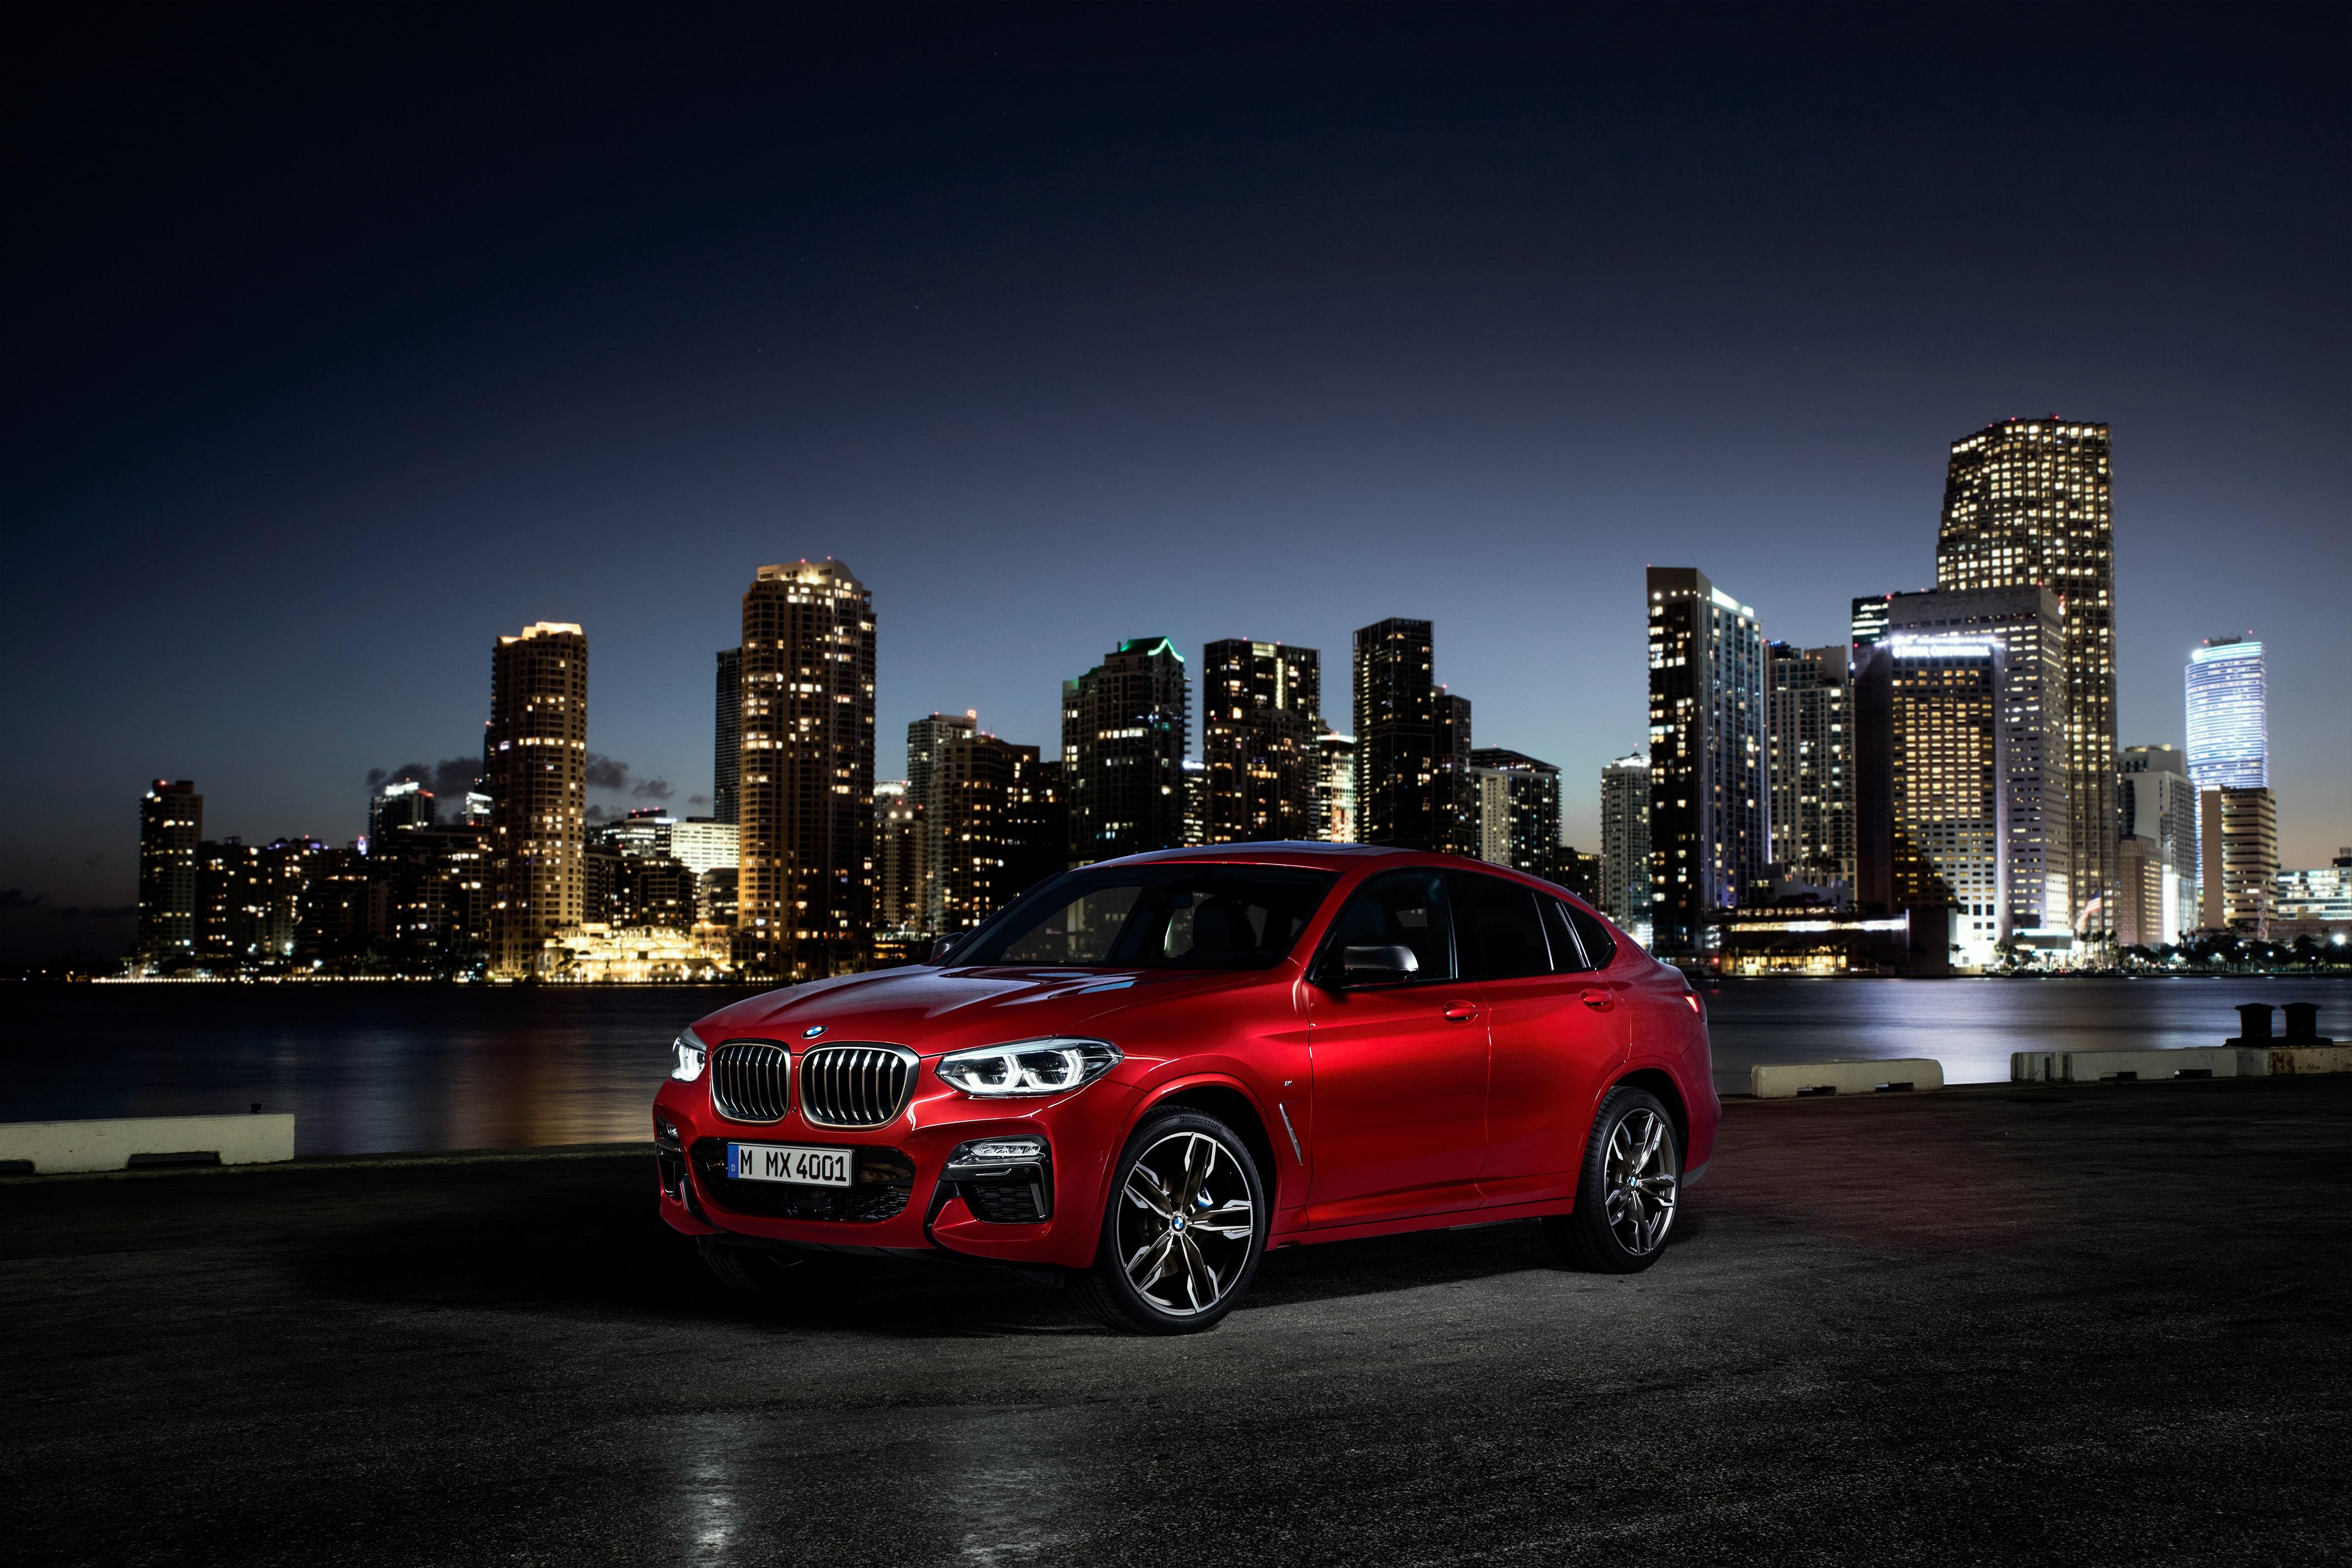 BMW X4 en noche